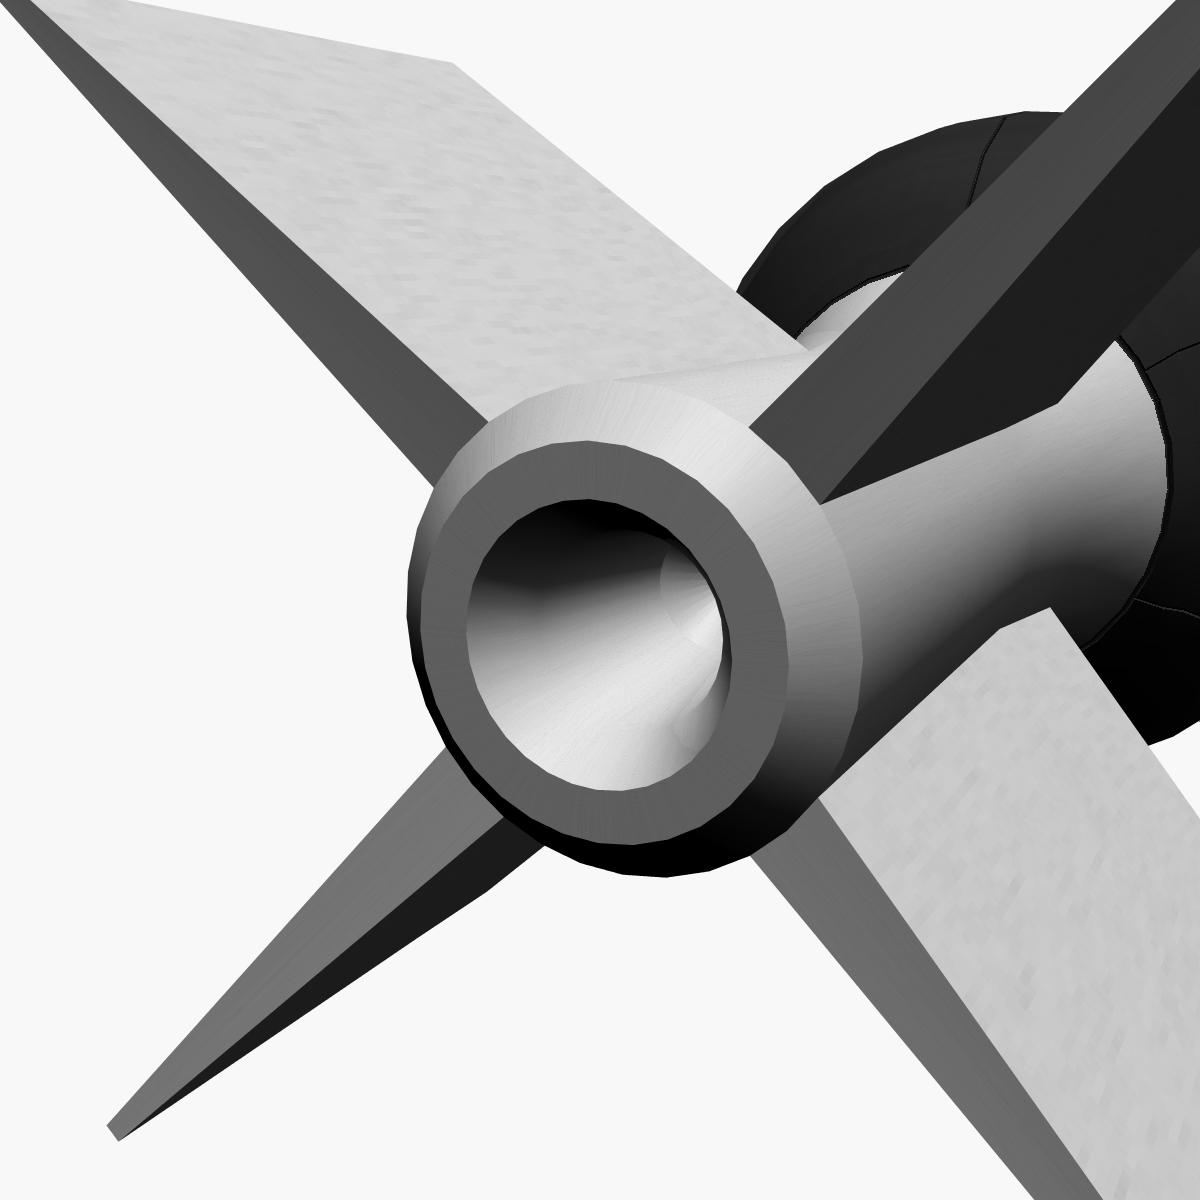 Bomb, Jolly Roger scheme 3d model 3ds dxf fbx blend cob dae X obj 162668